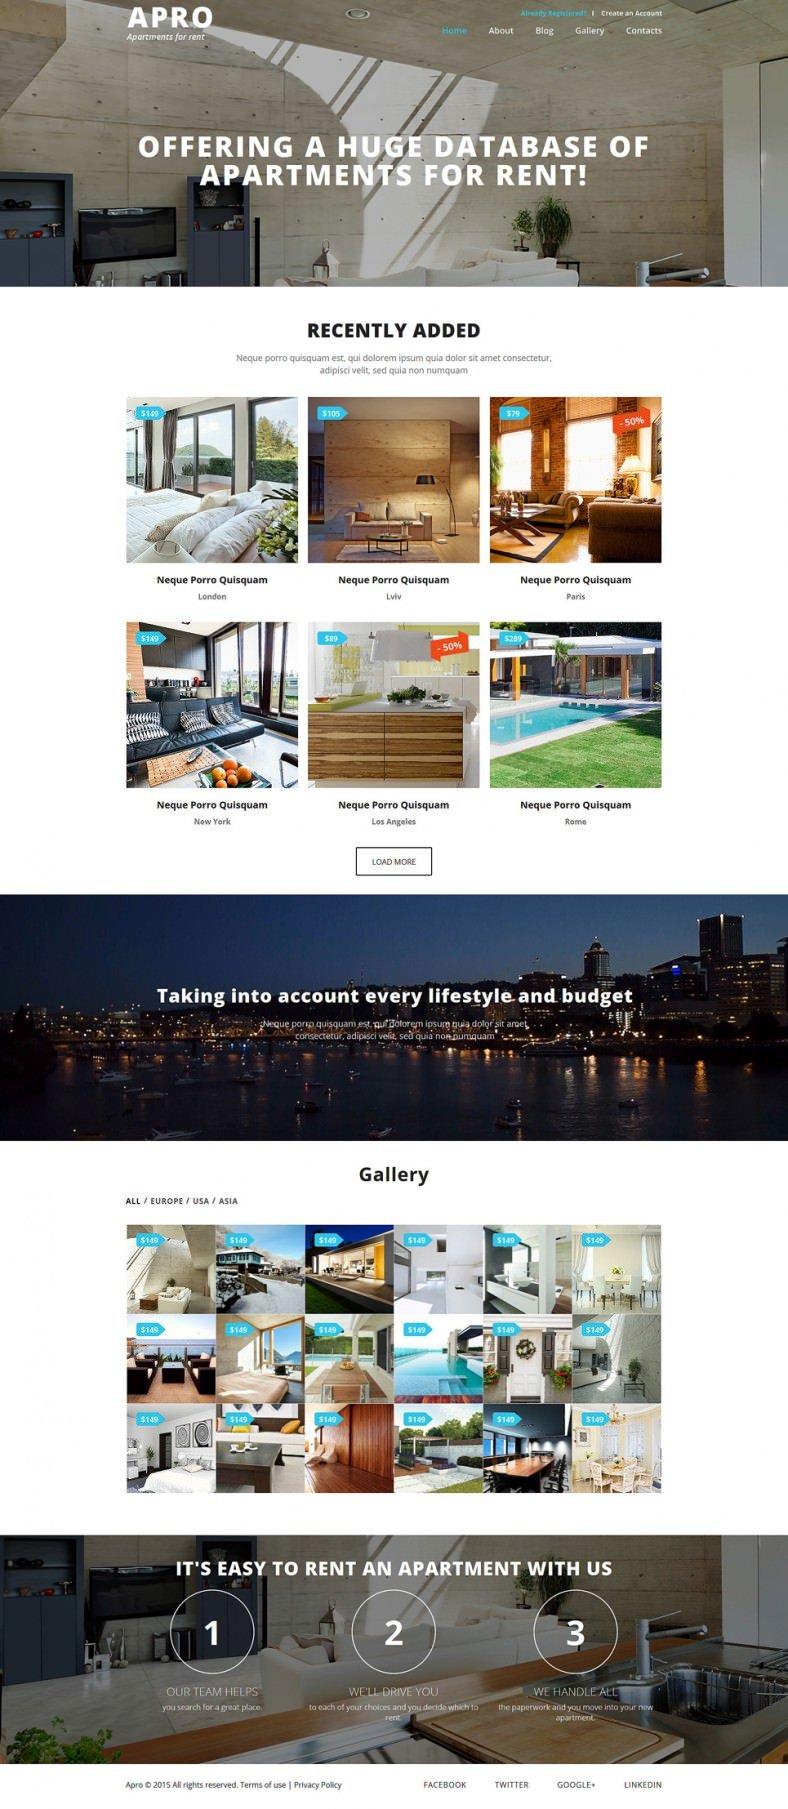 Wallpaper Joomla Templates Video Background Website Joomla Templates & Themes|Free & Premium | Free & Premium Templates